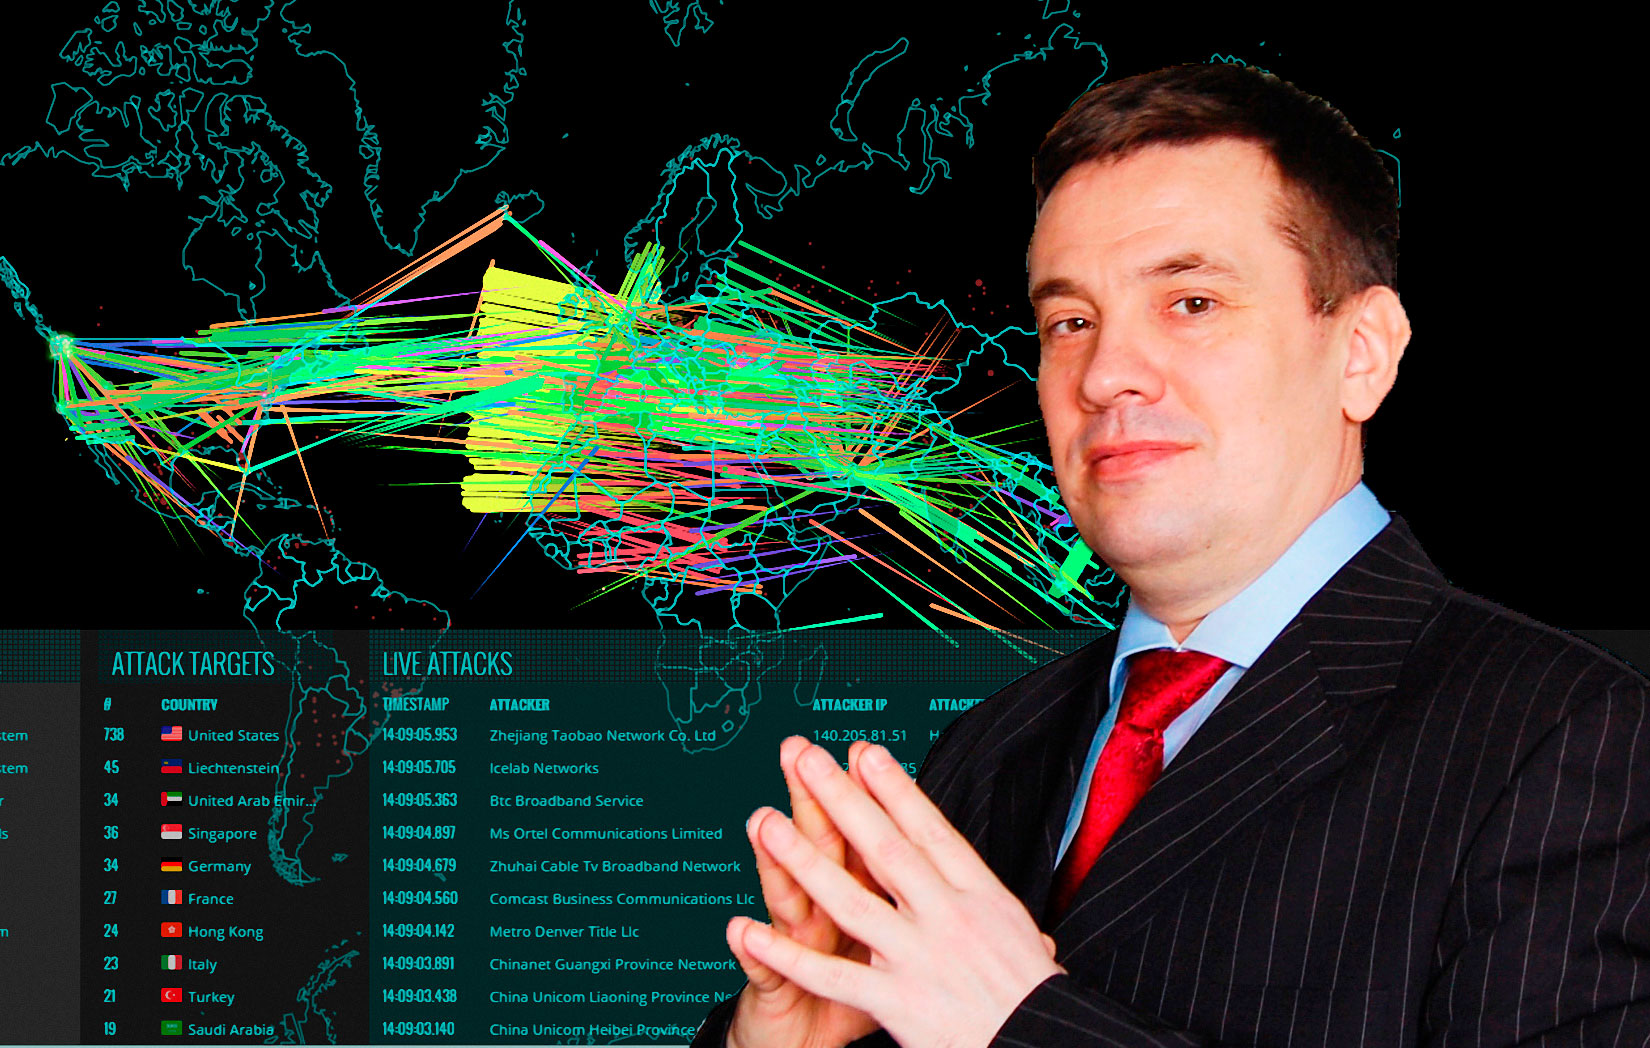 Cybersecurity, Кибербезопасность